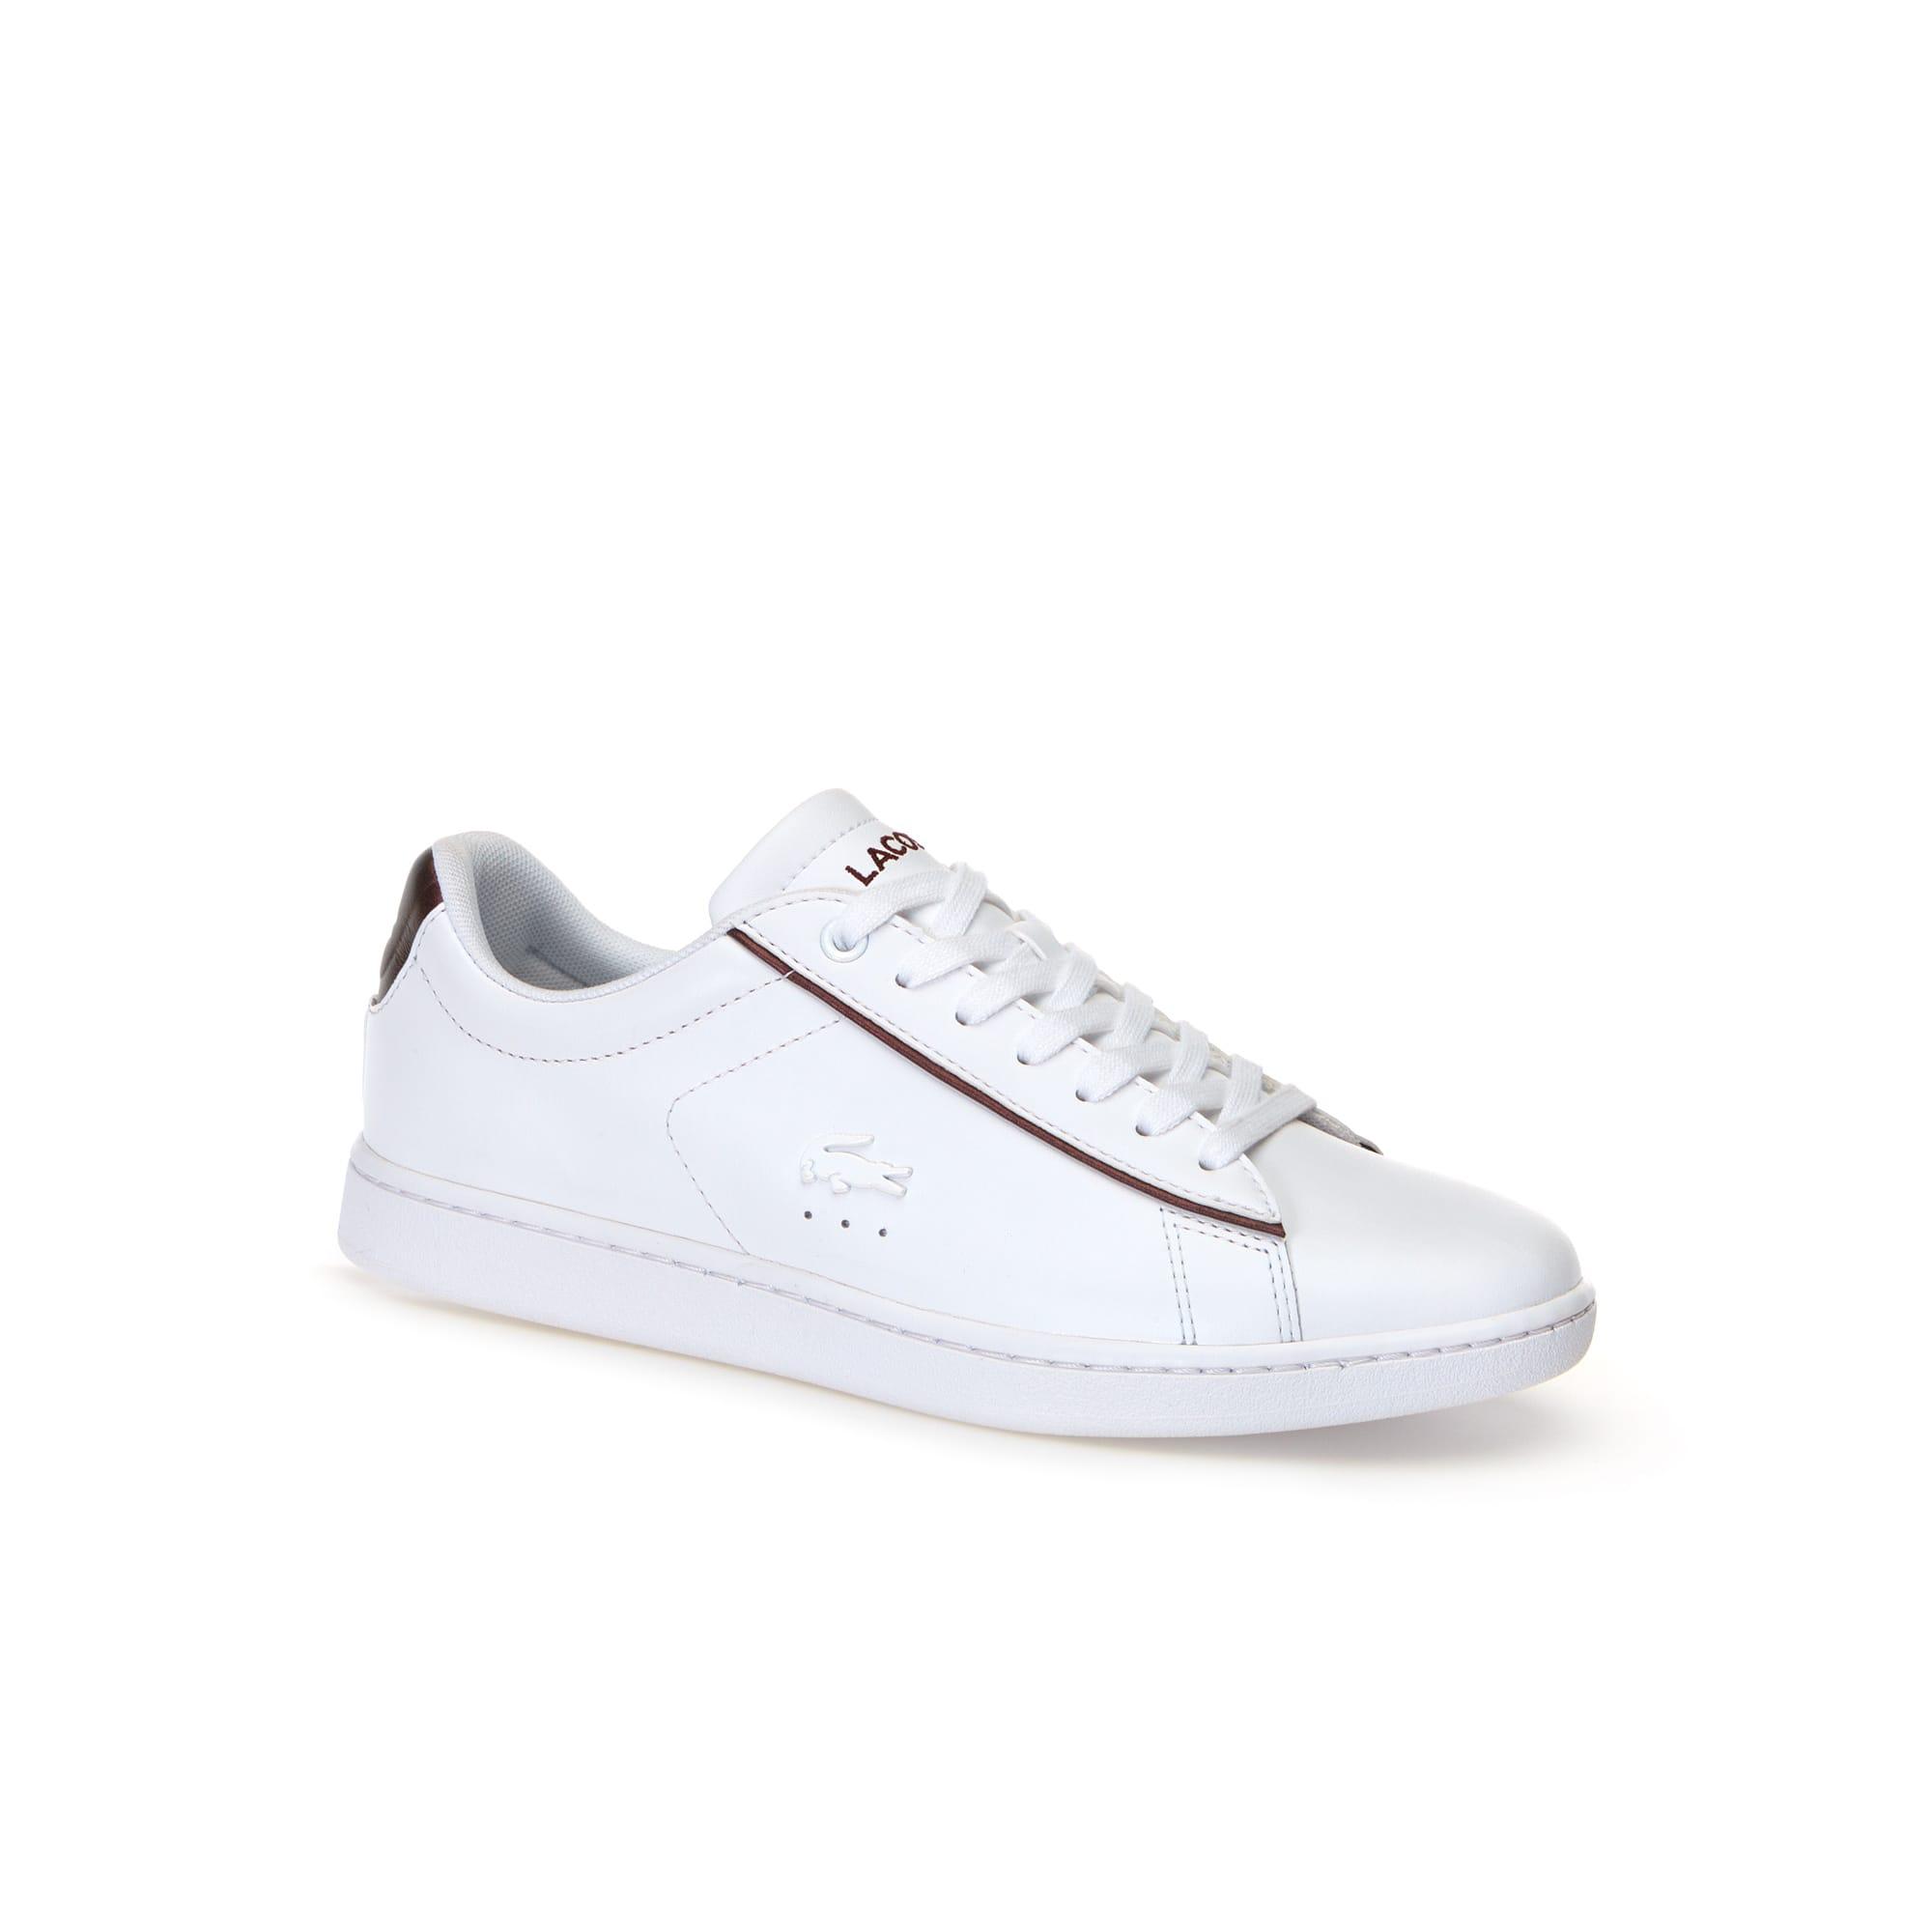 Damen Strap Sneakers CARNABY EVO aus Leder